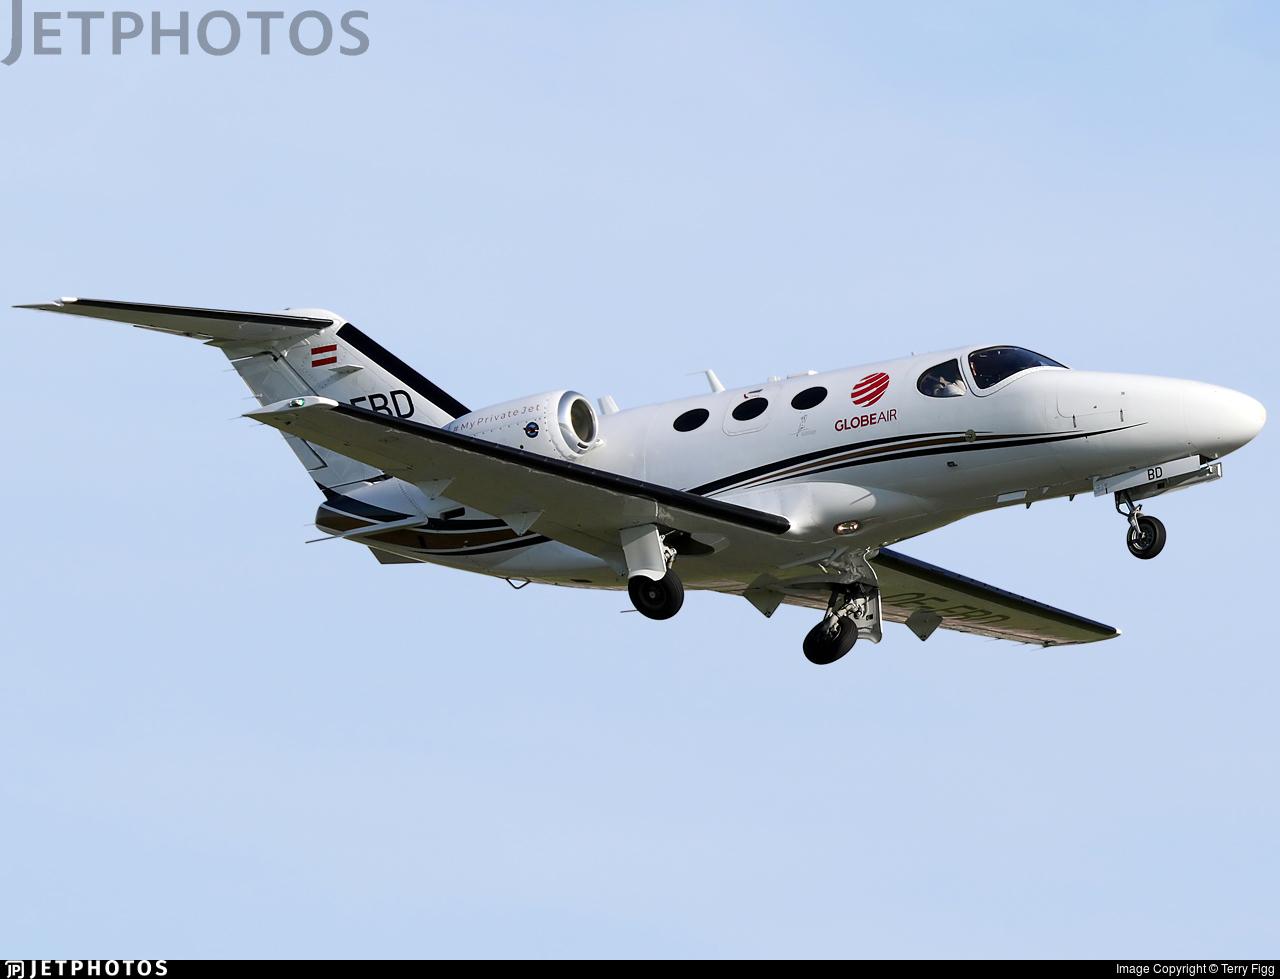 OE-FBD - Cessna 510 Citation Mustang - GlobeAir